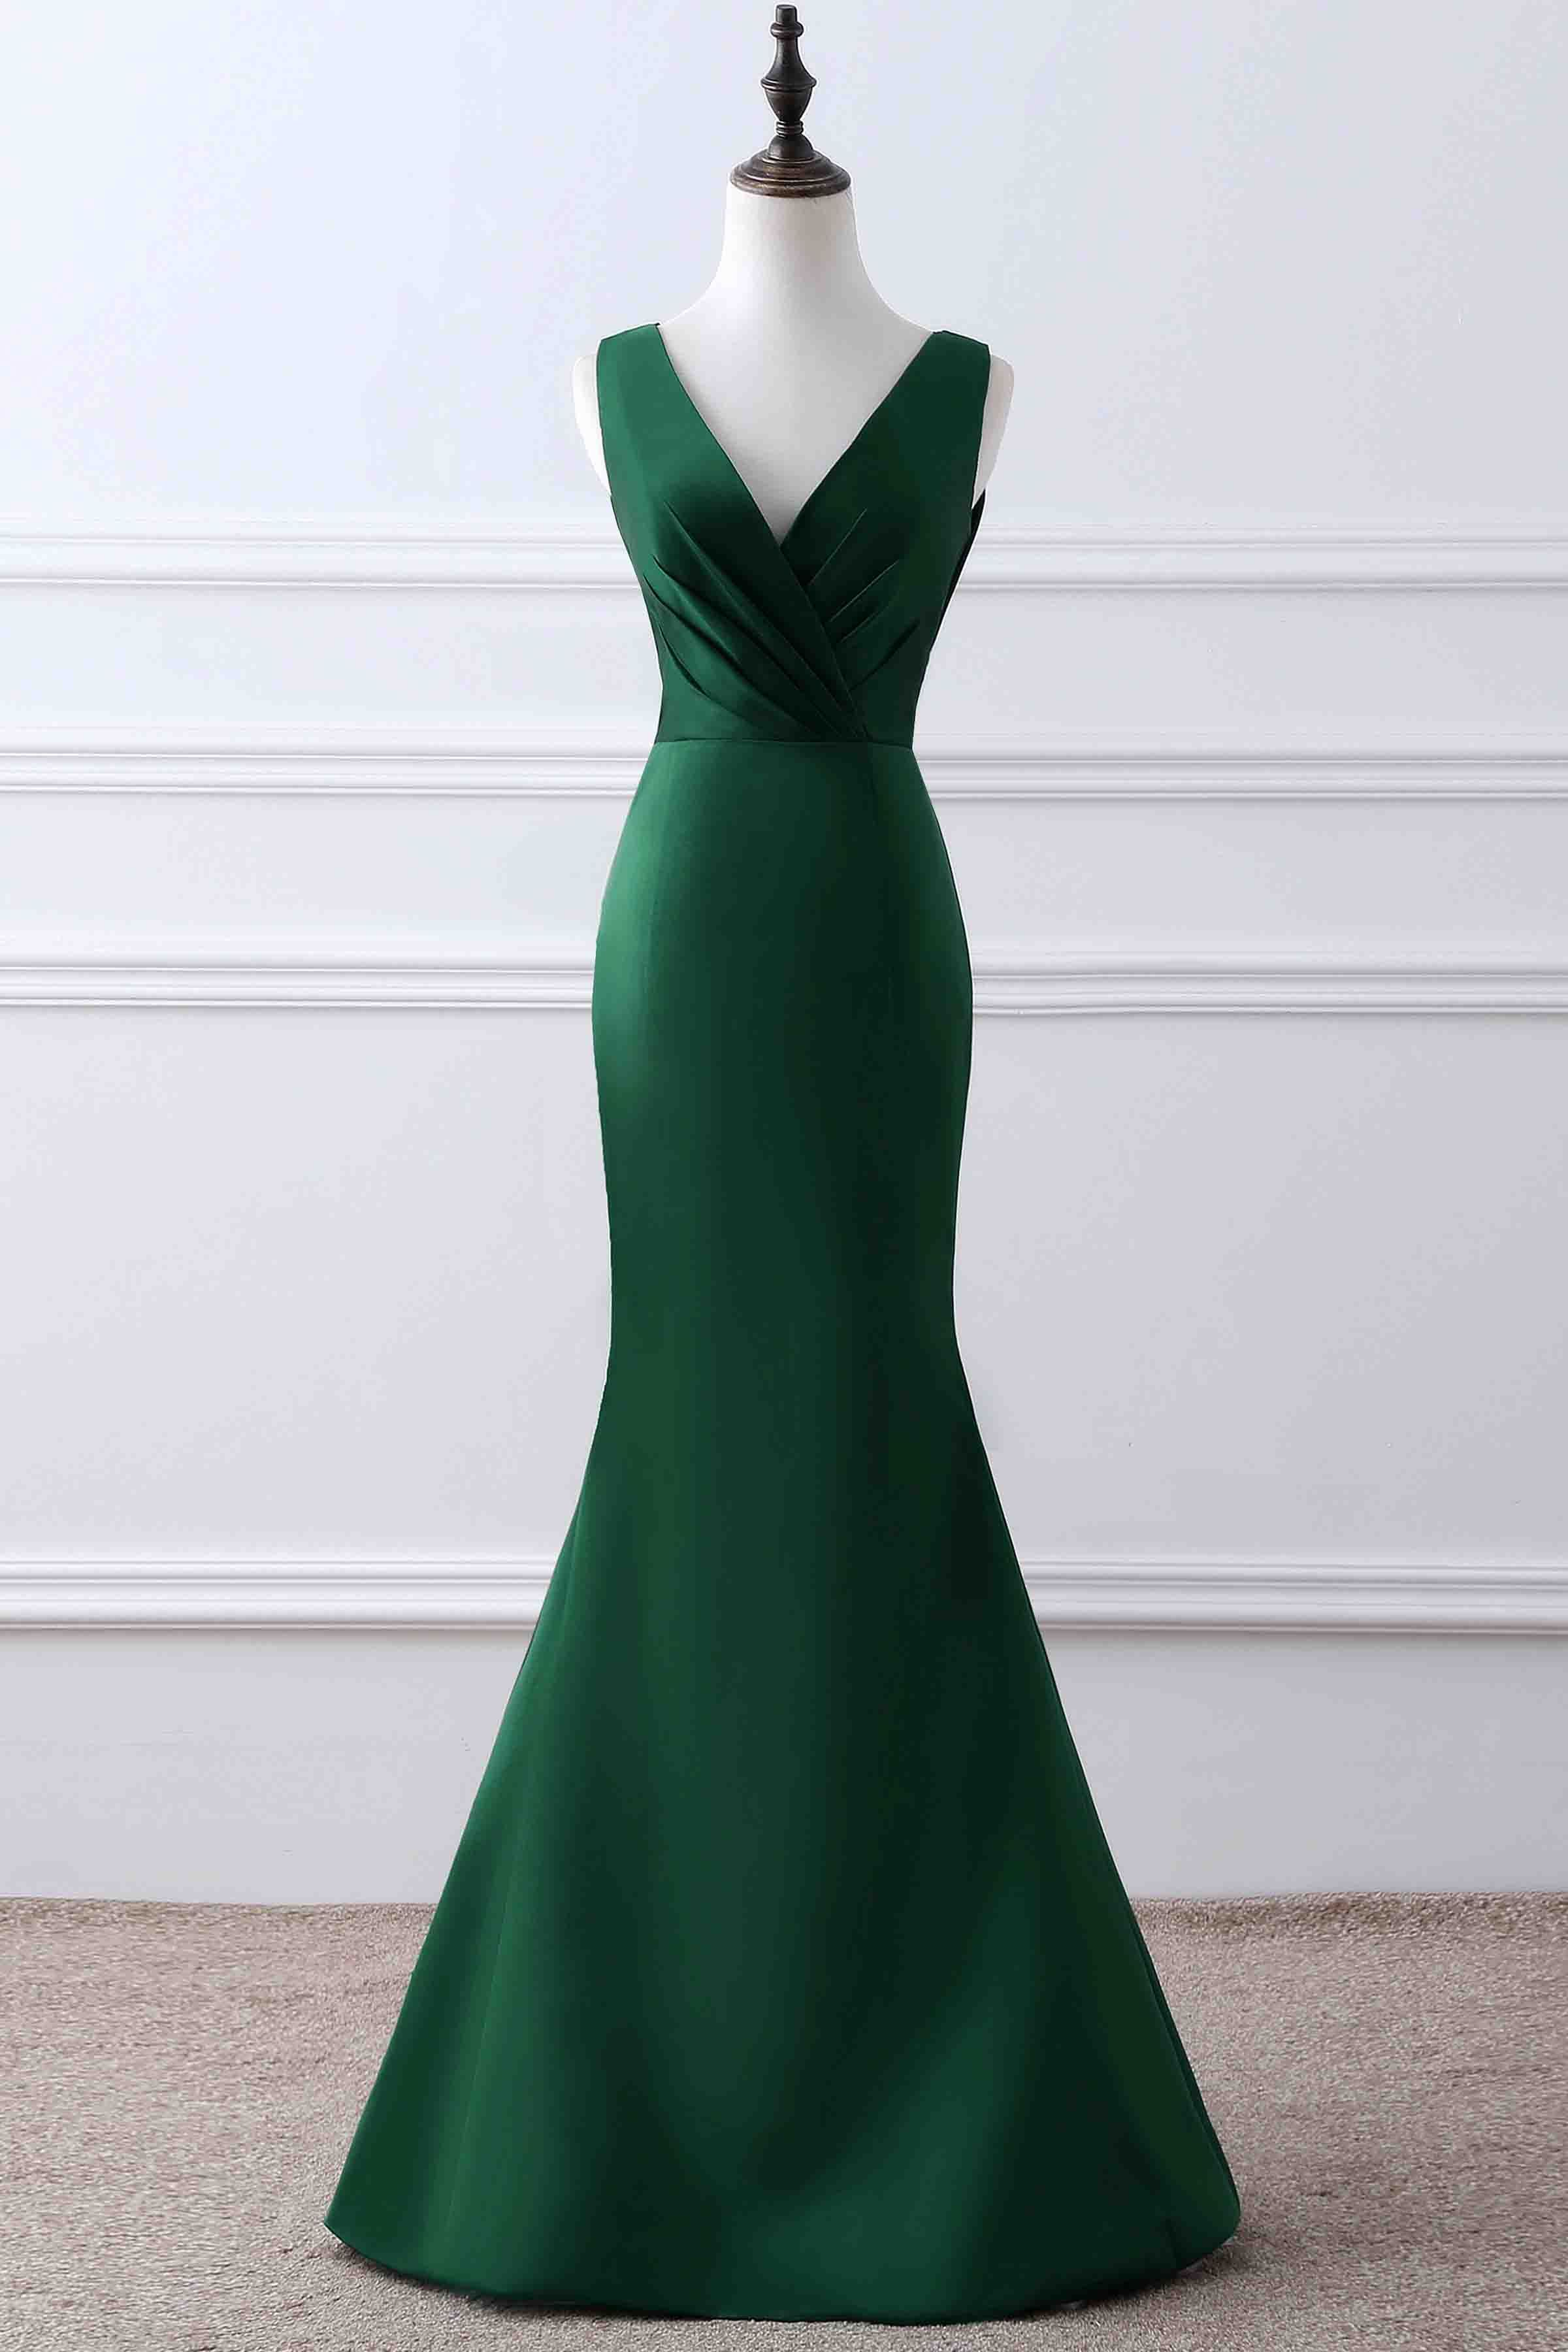 Green dress for wedding party  Simple green matte satin prom dress ball gown elegant vneck long